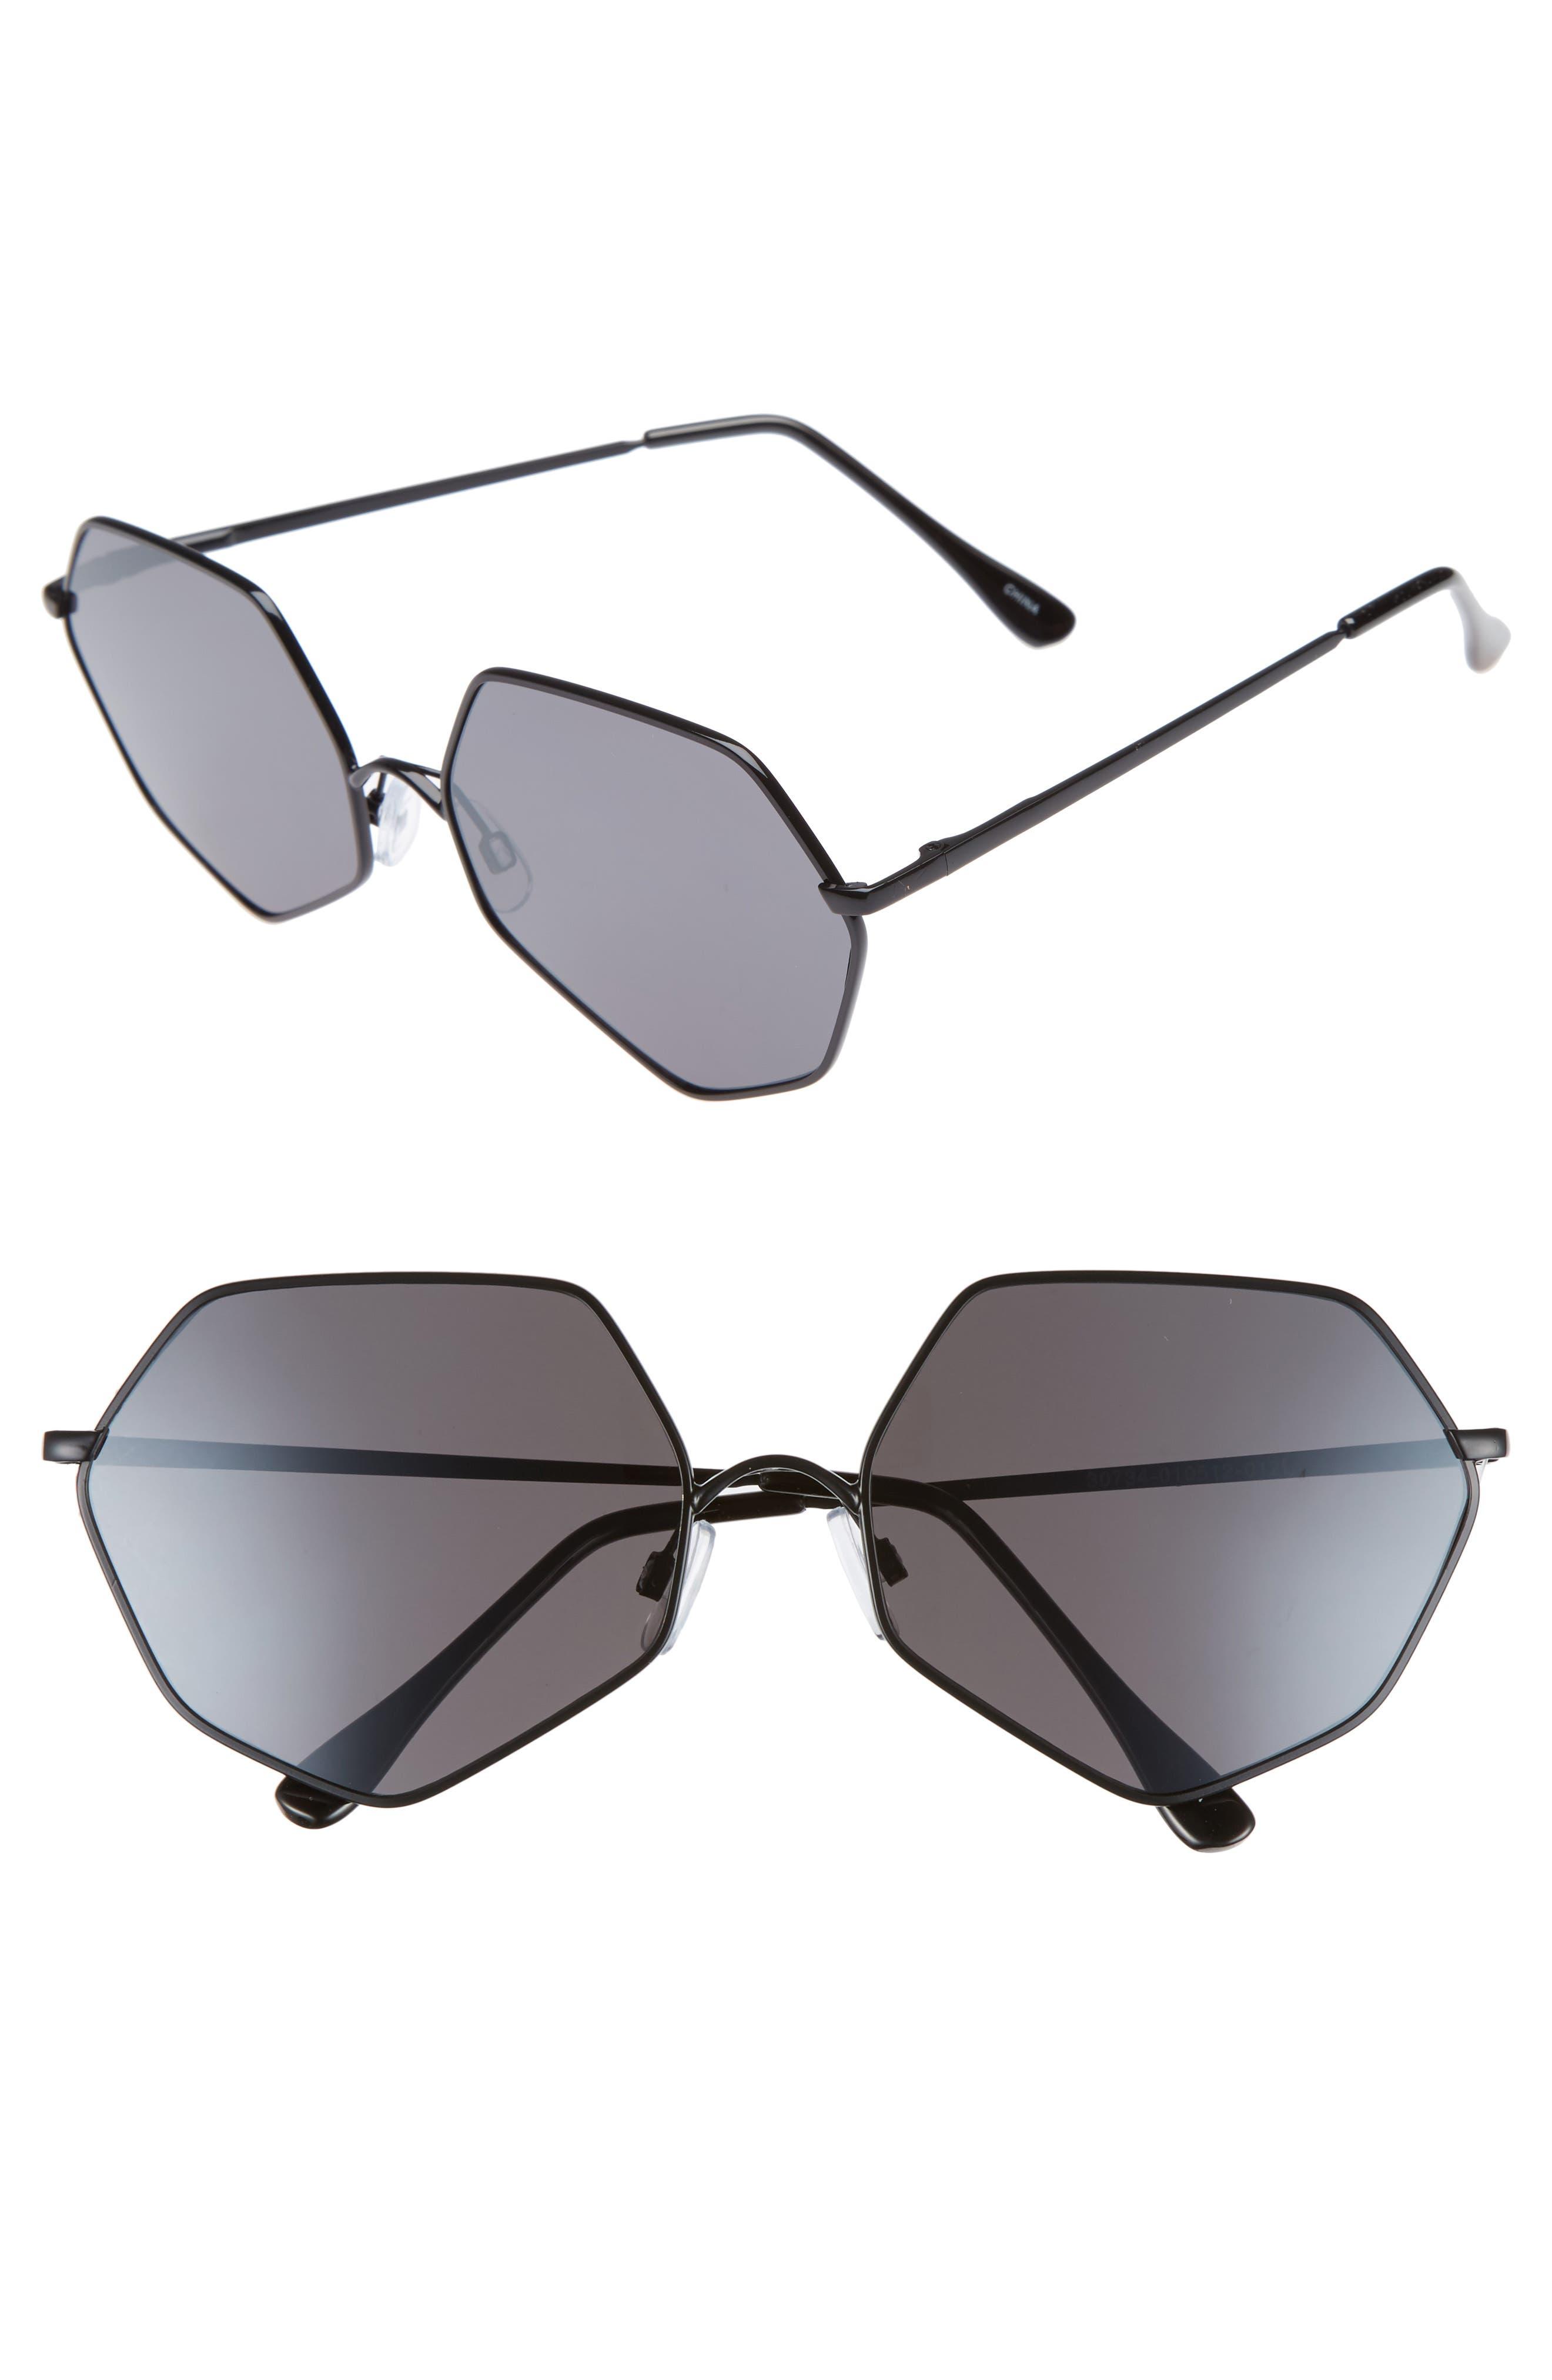 60 mm Geometric Metal Aviator Sunglasses,                         Main,                         color, 001